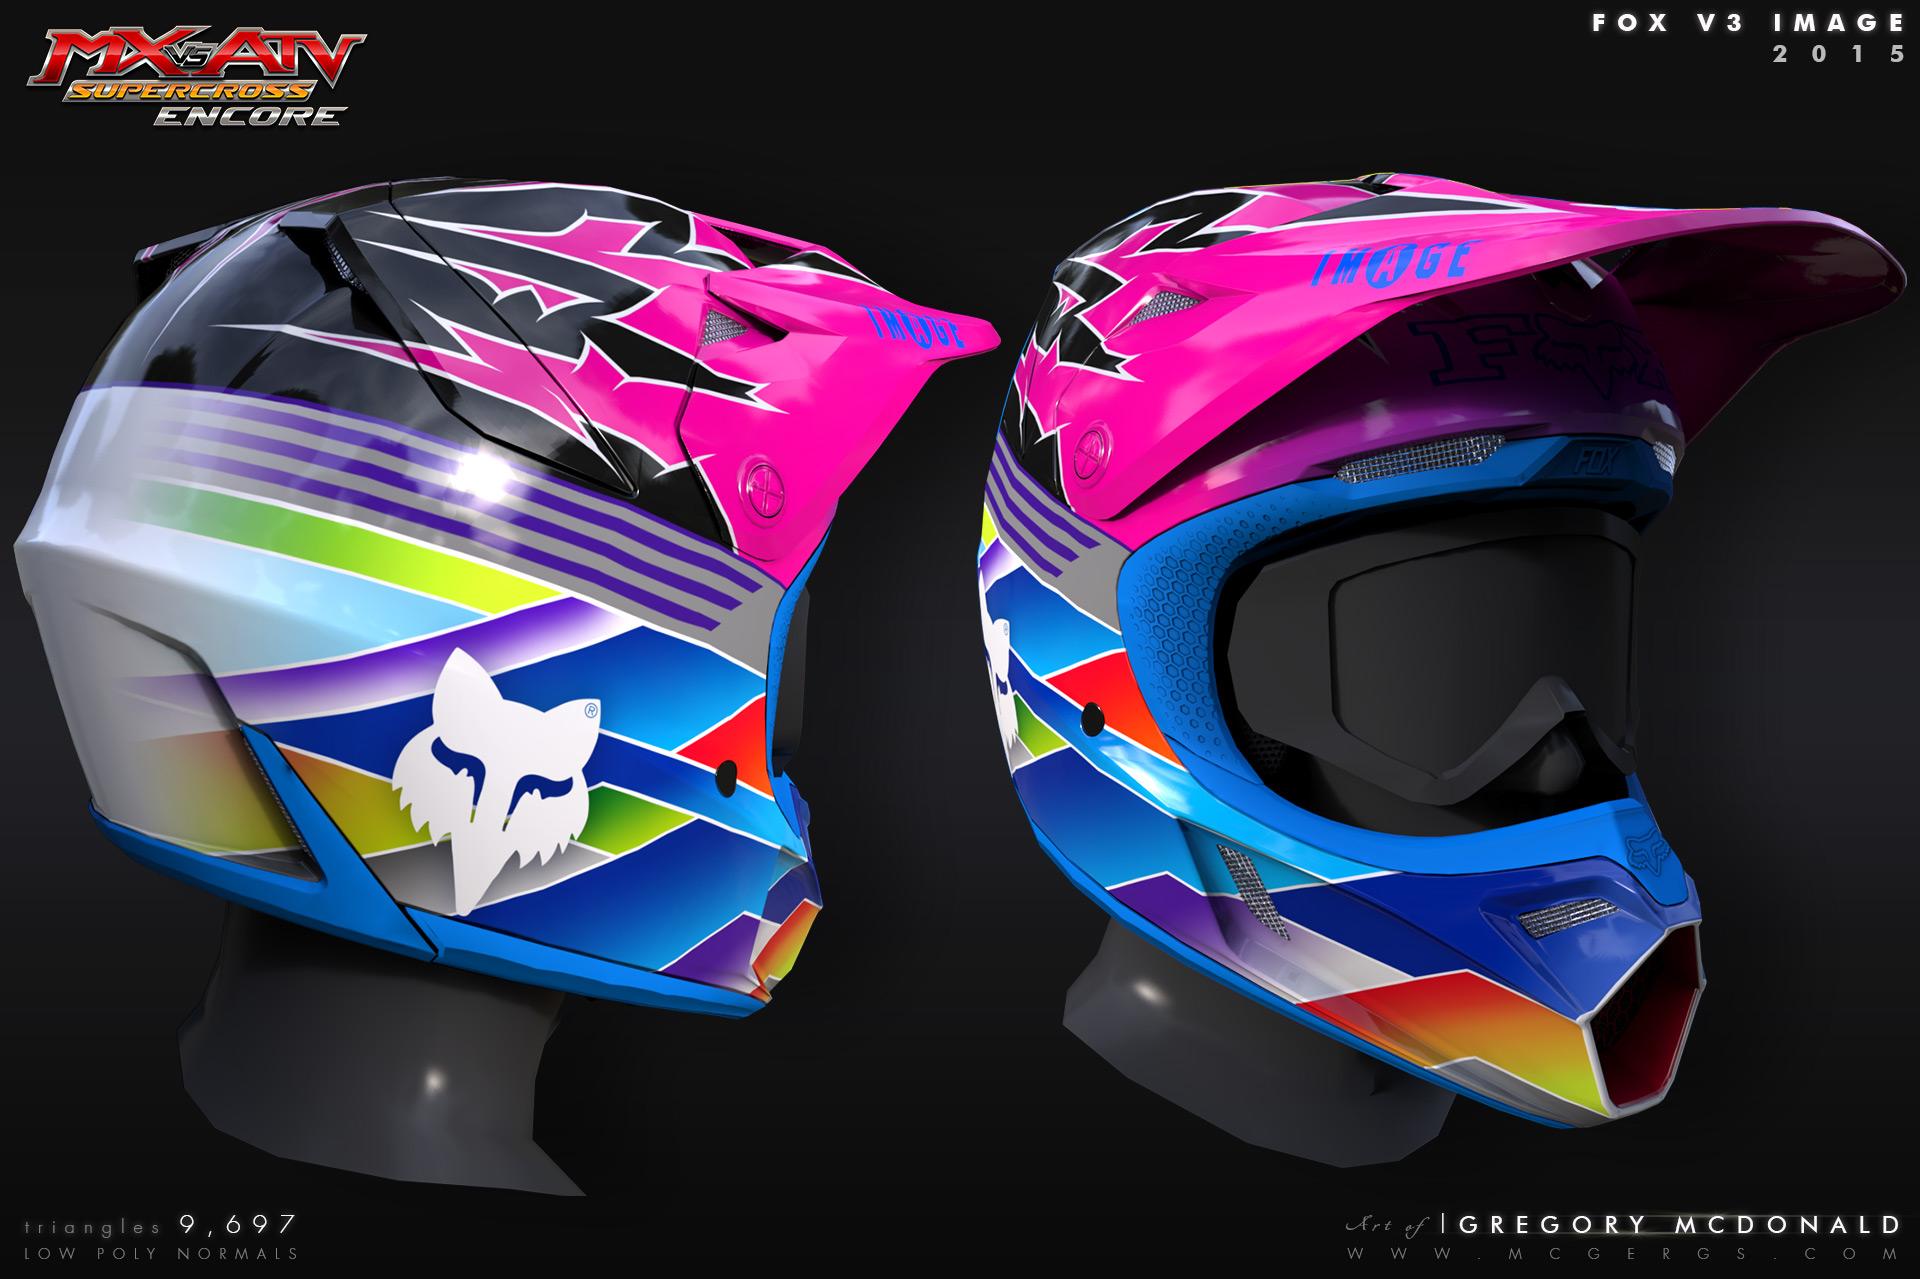 Helmet_FoxV3_Image